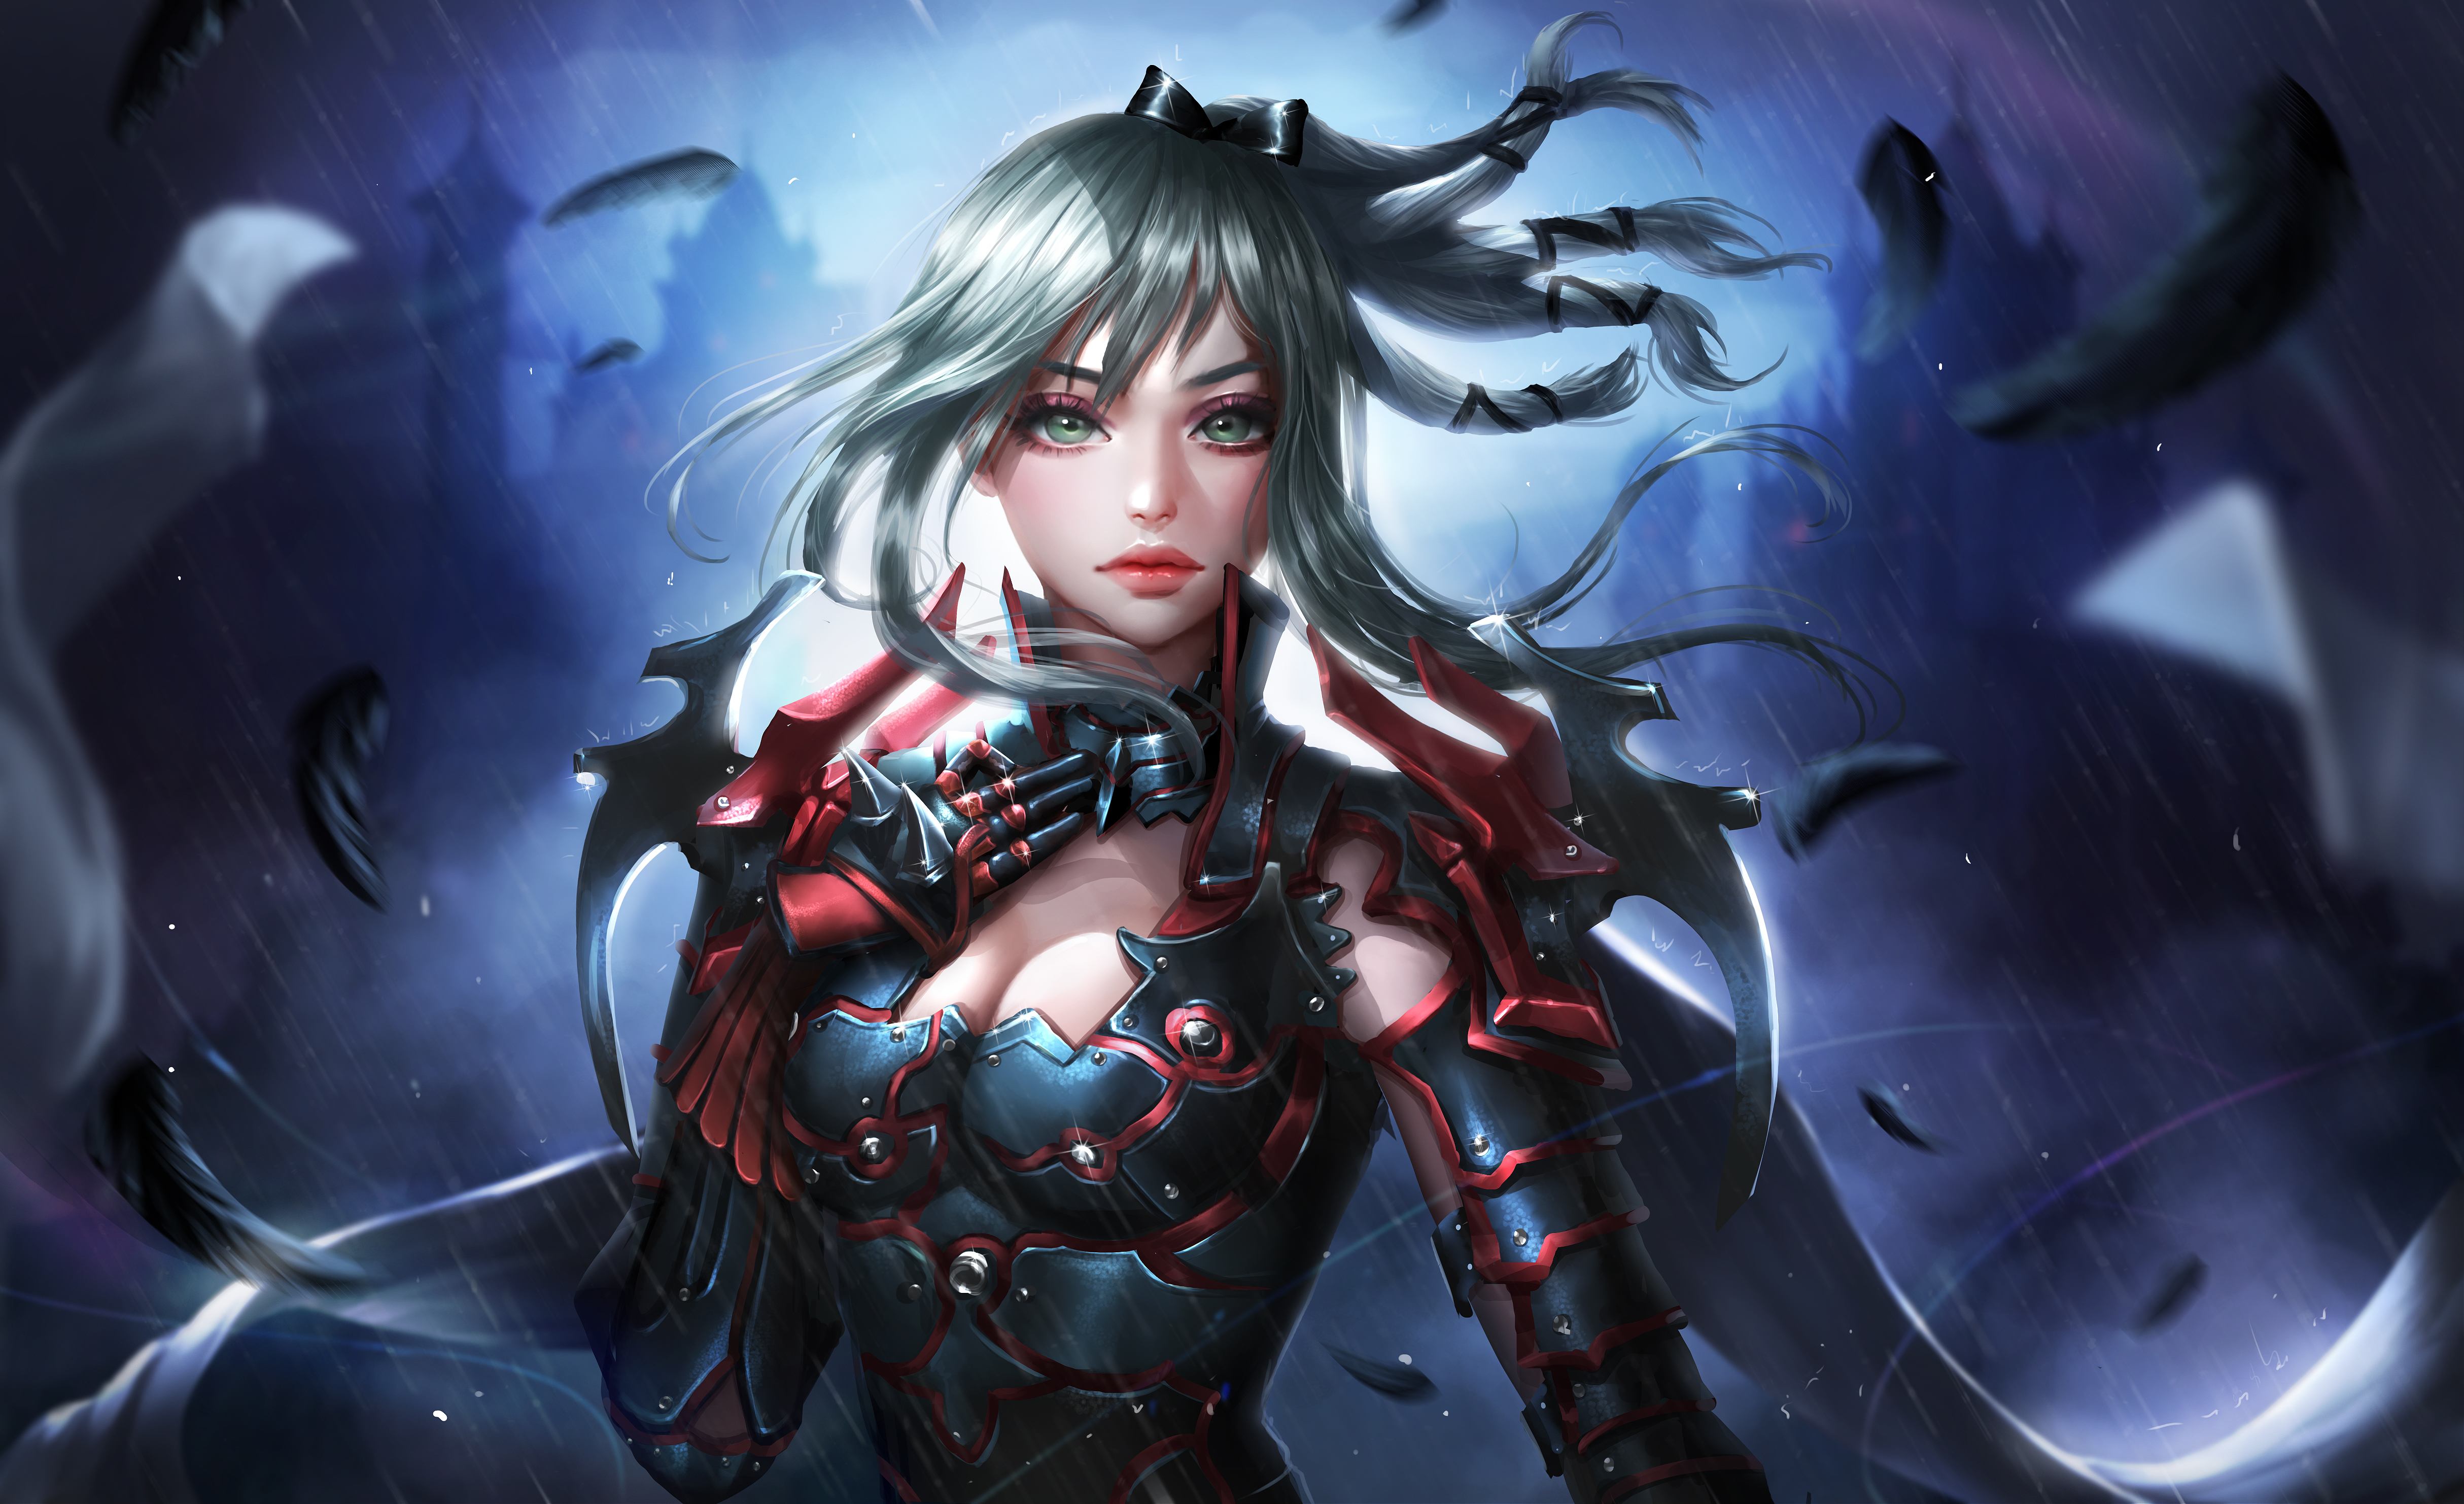 Aranea Highwind Final Fantasy Xv 5k, HD Games, 4k ...